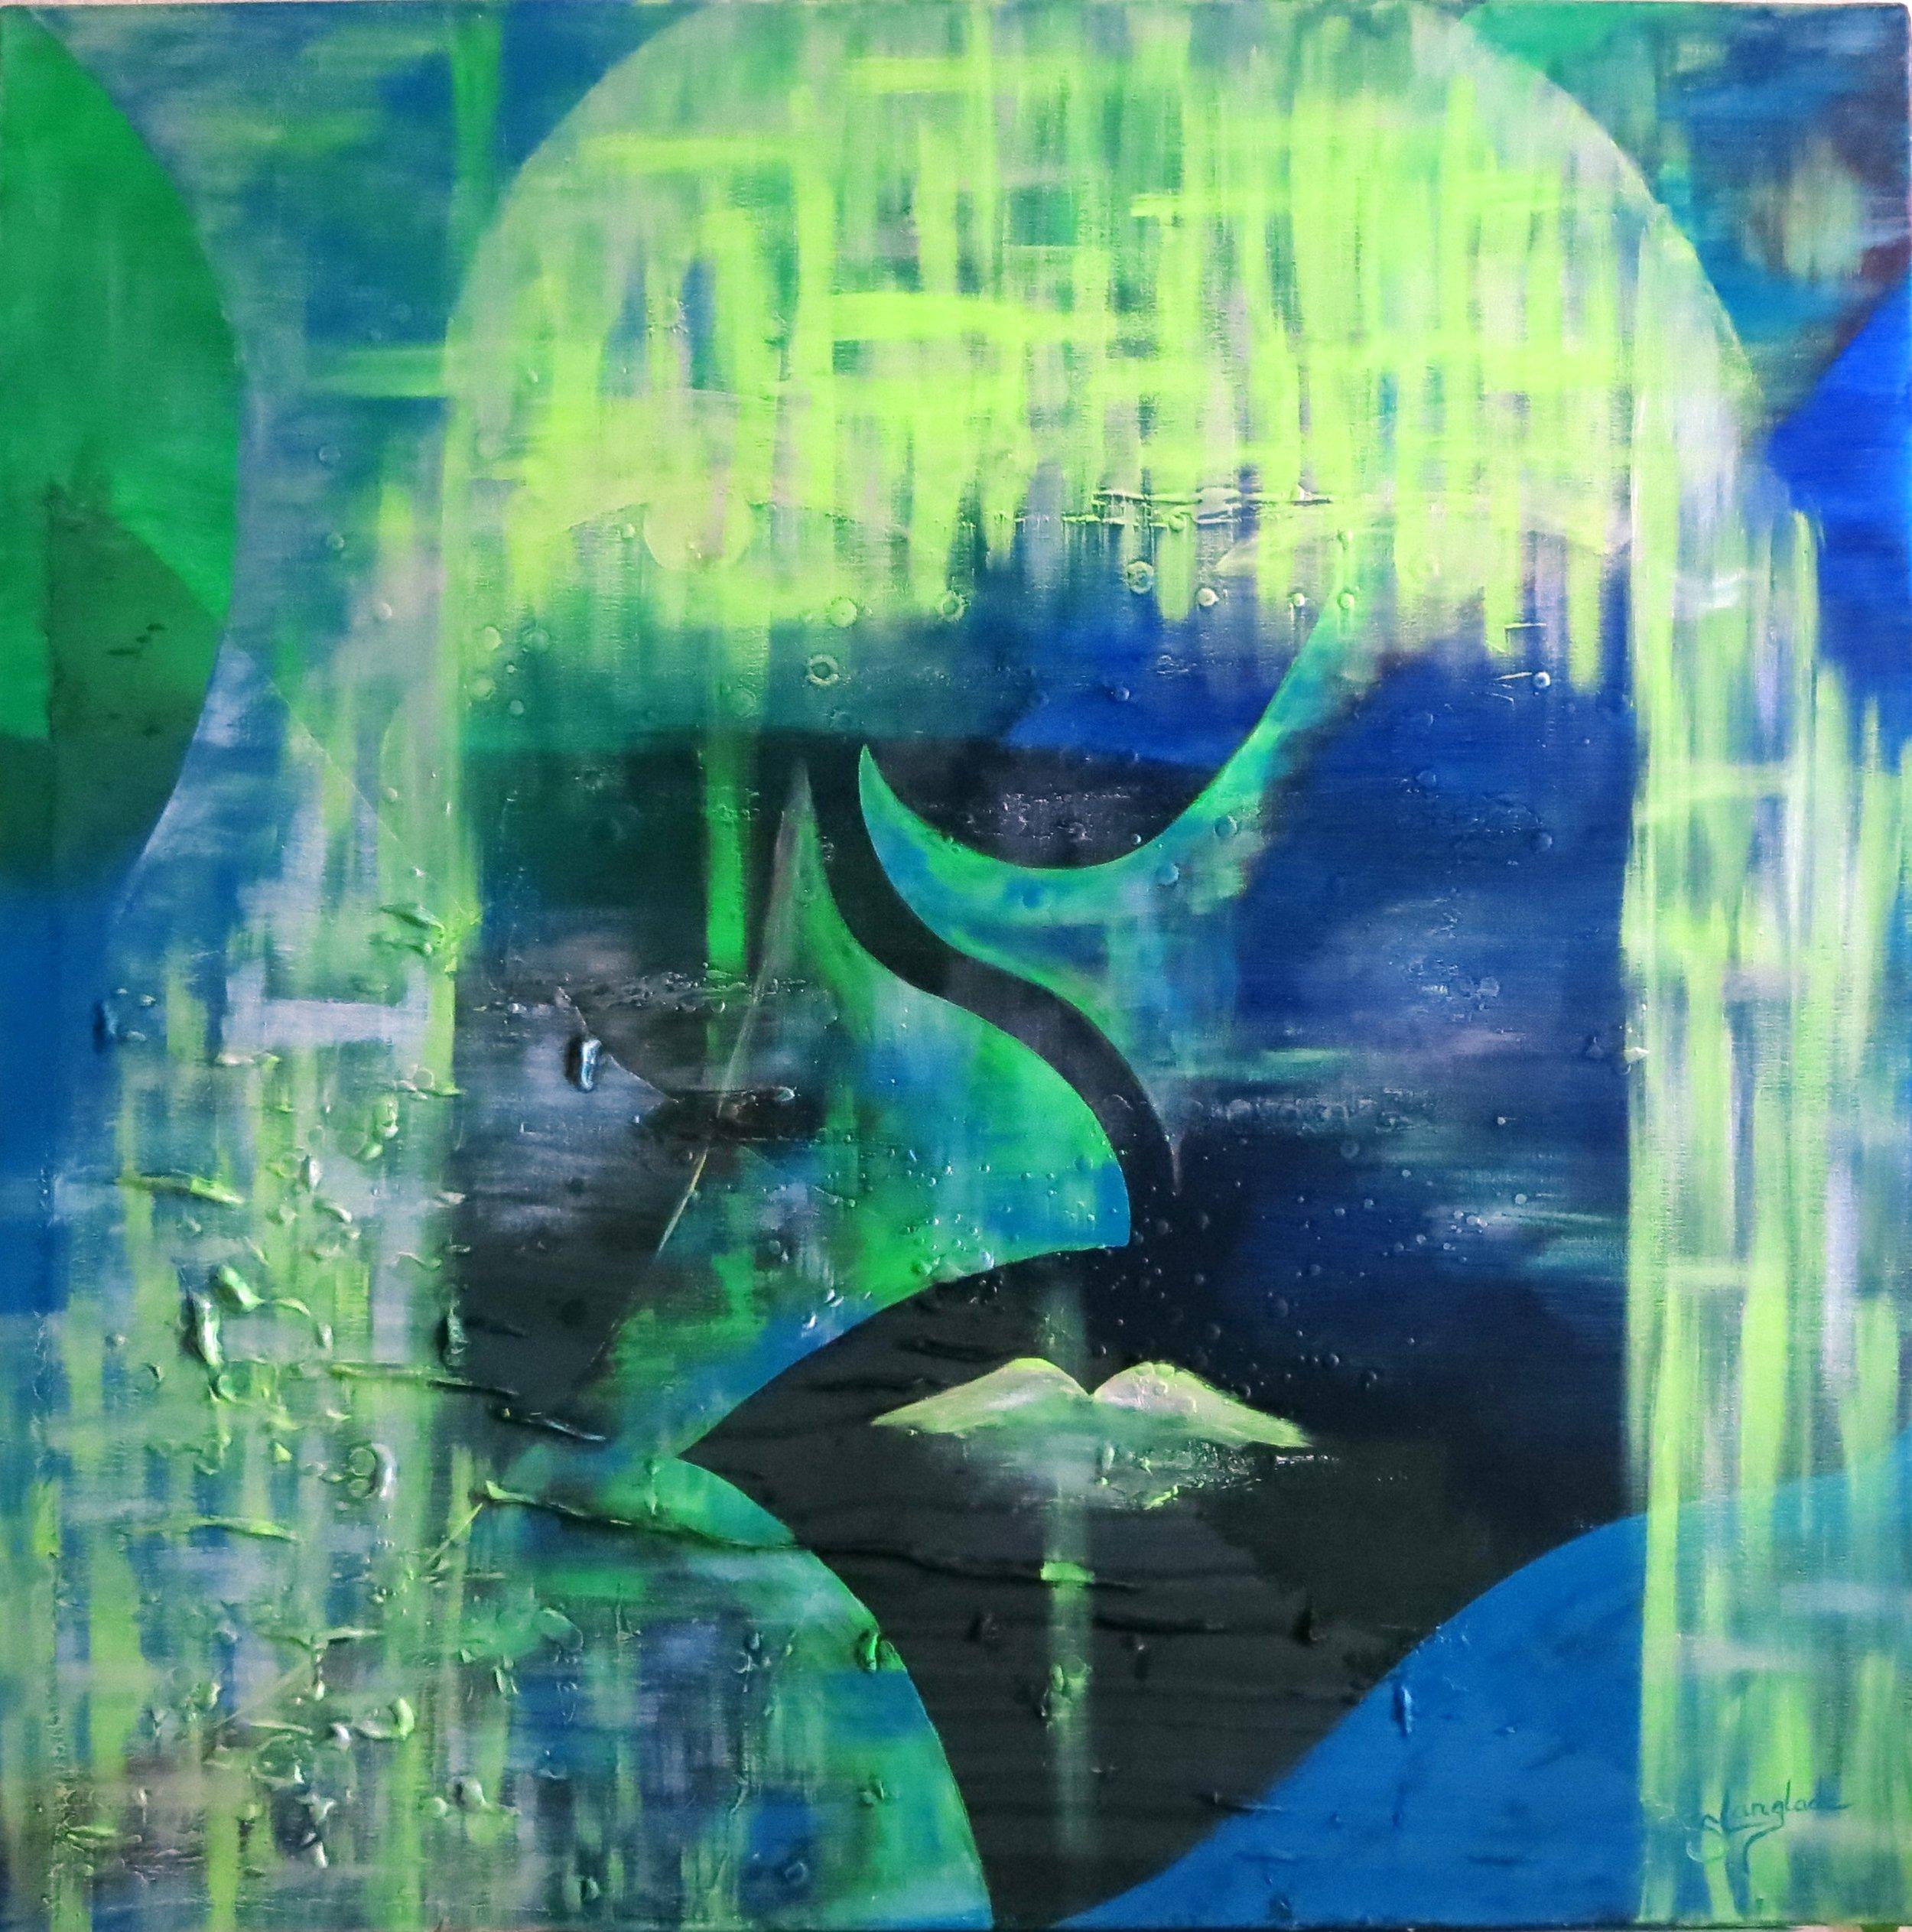 2012 07 07 Insondable clairvoyance HD.JPG